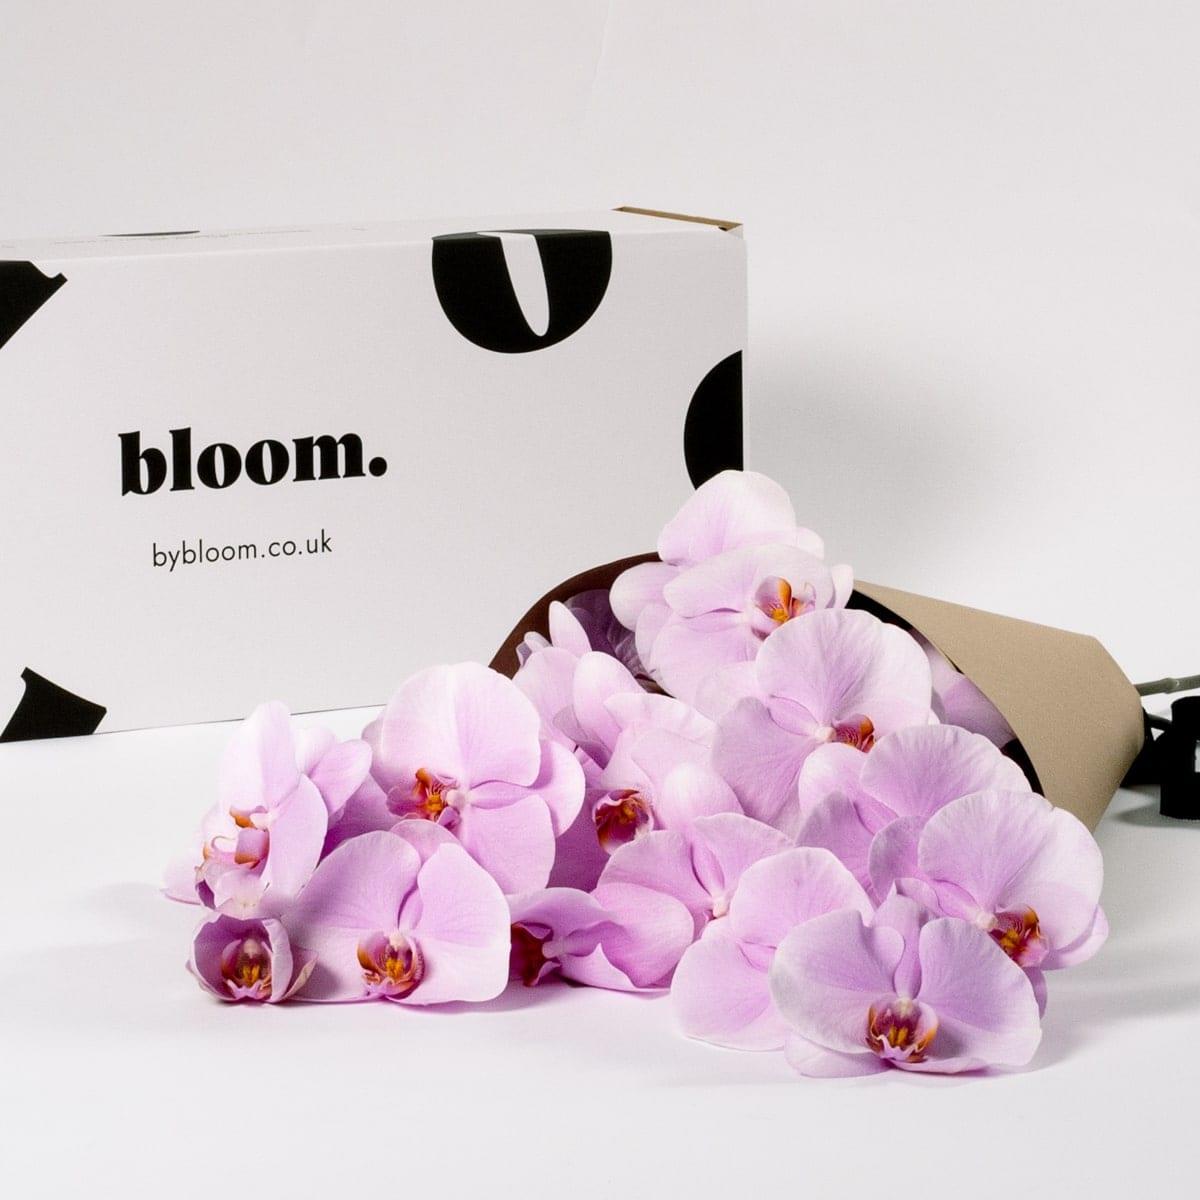 Bloom Flower Delivery | Ballet Slipper Pink Phalaenopsis Orchid